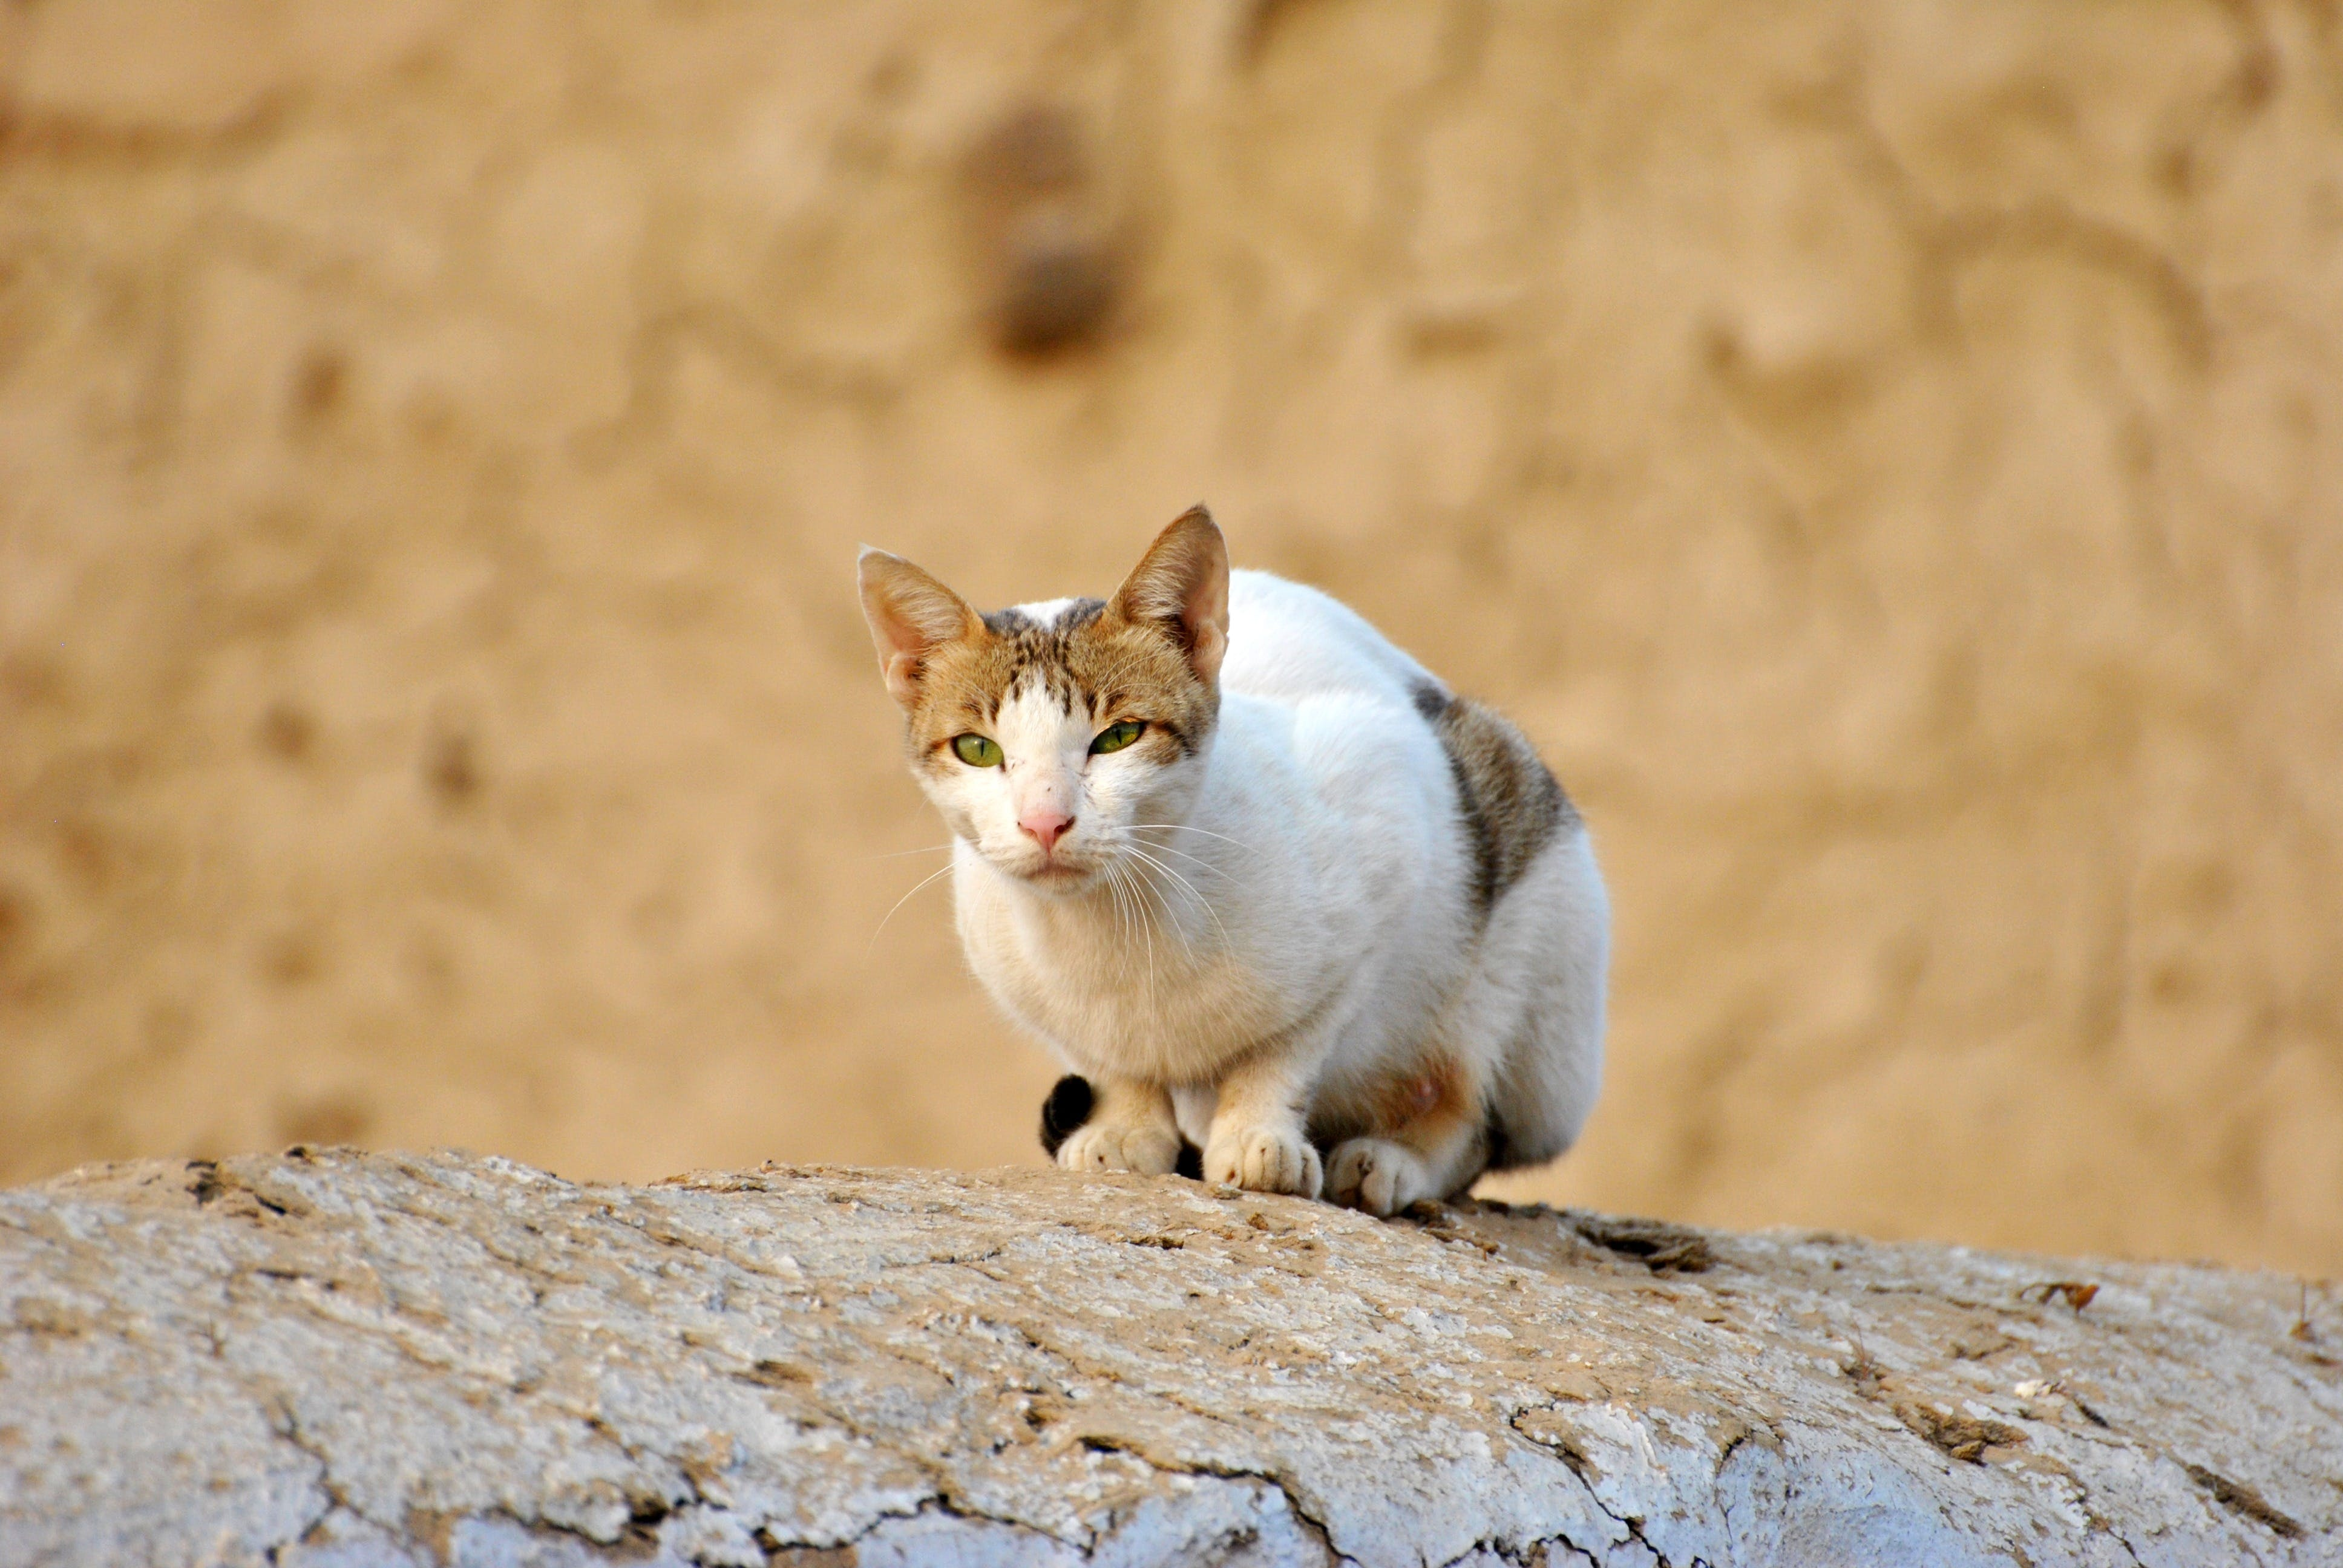 White Tabby Cat on Grey Rock